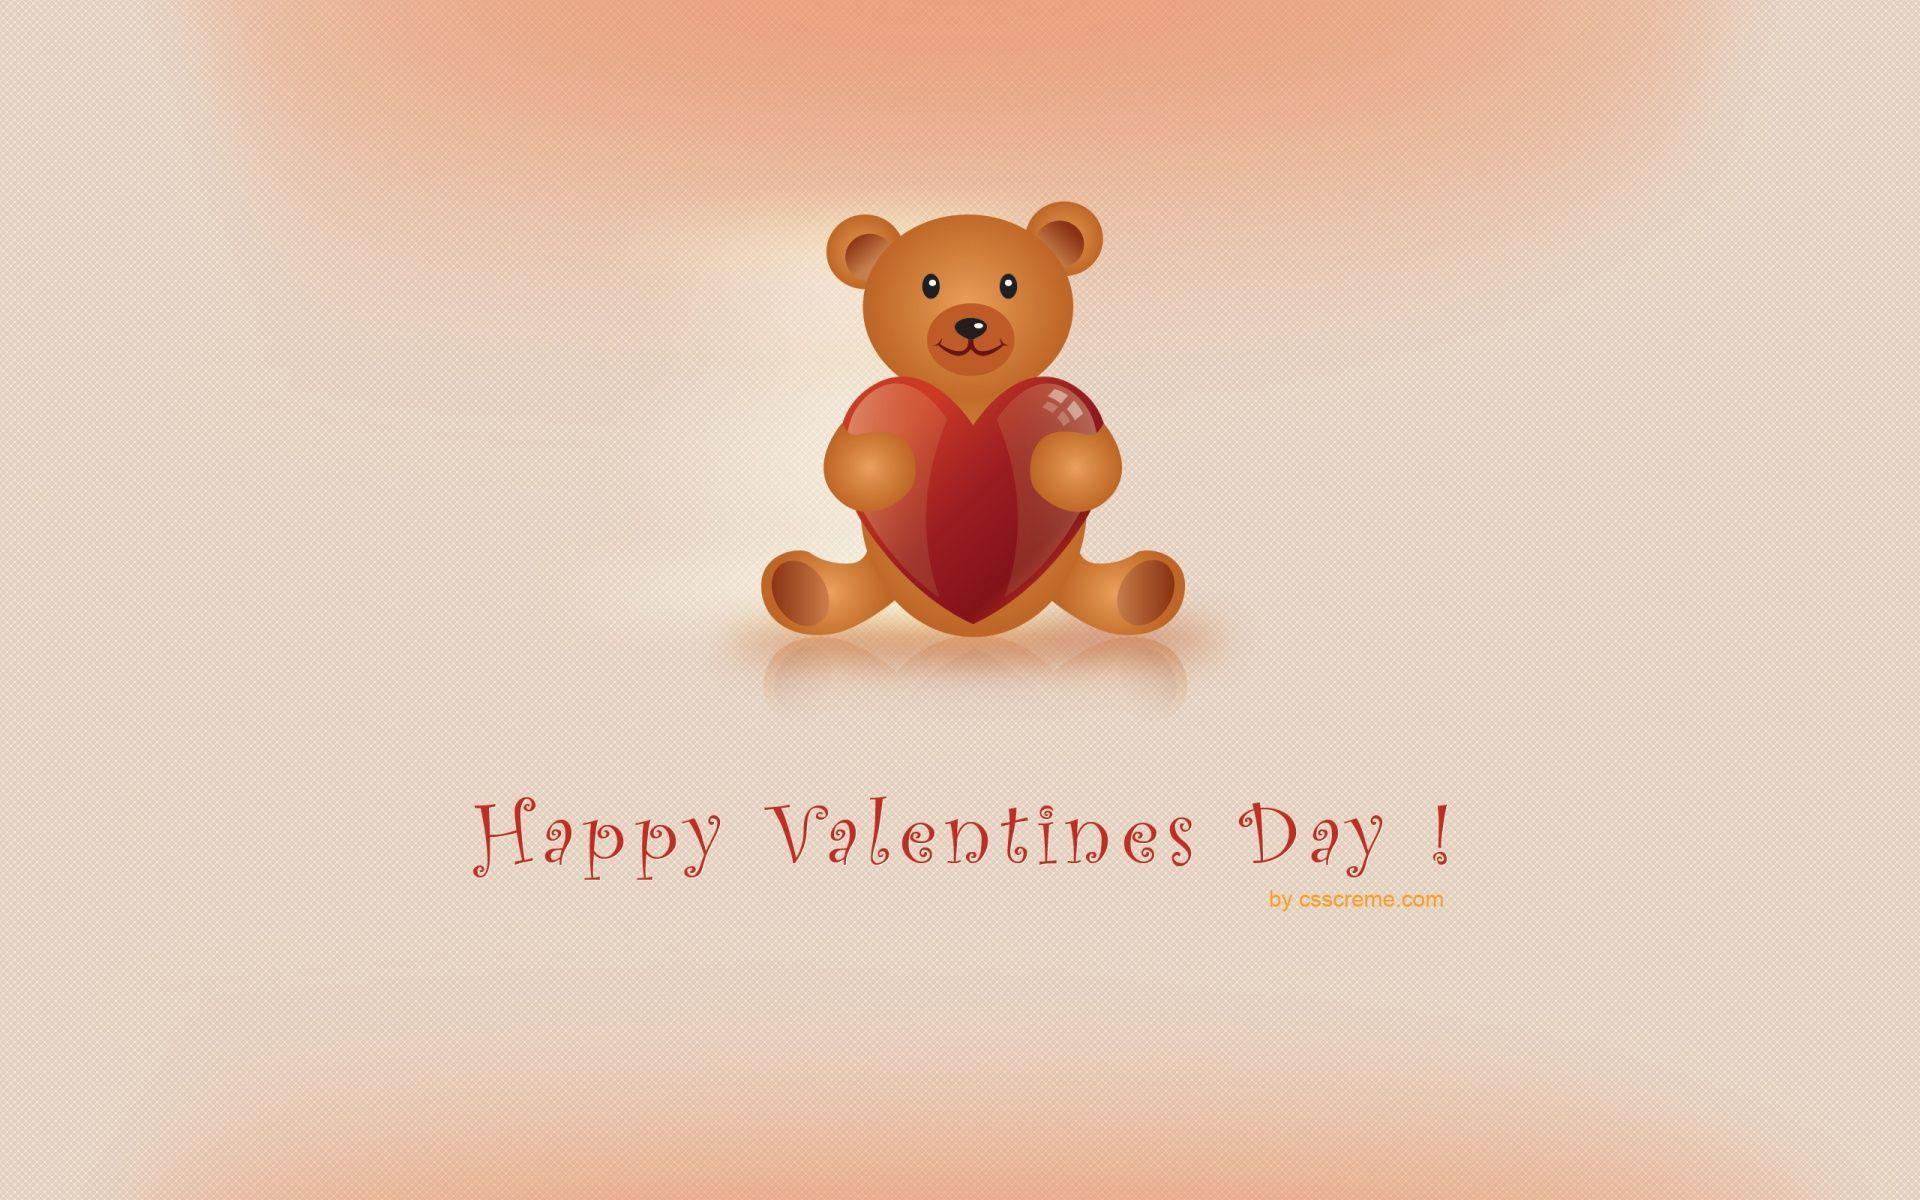 Valentine Teddy Bear Wallpaper | Home Concepts Ideas